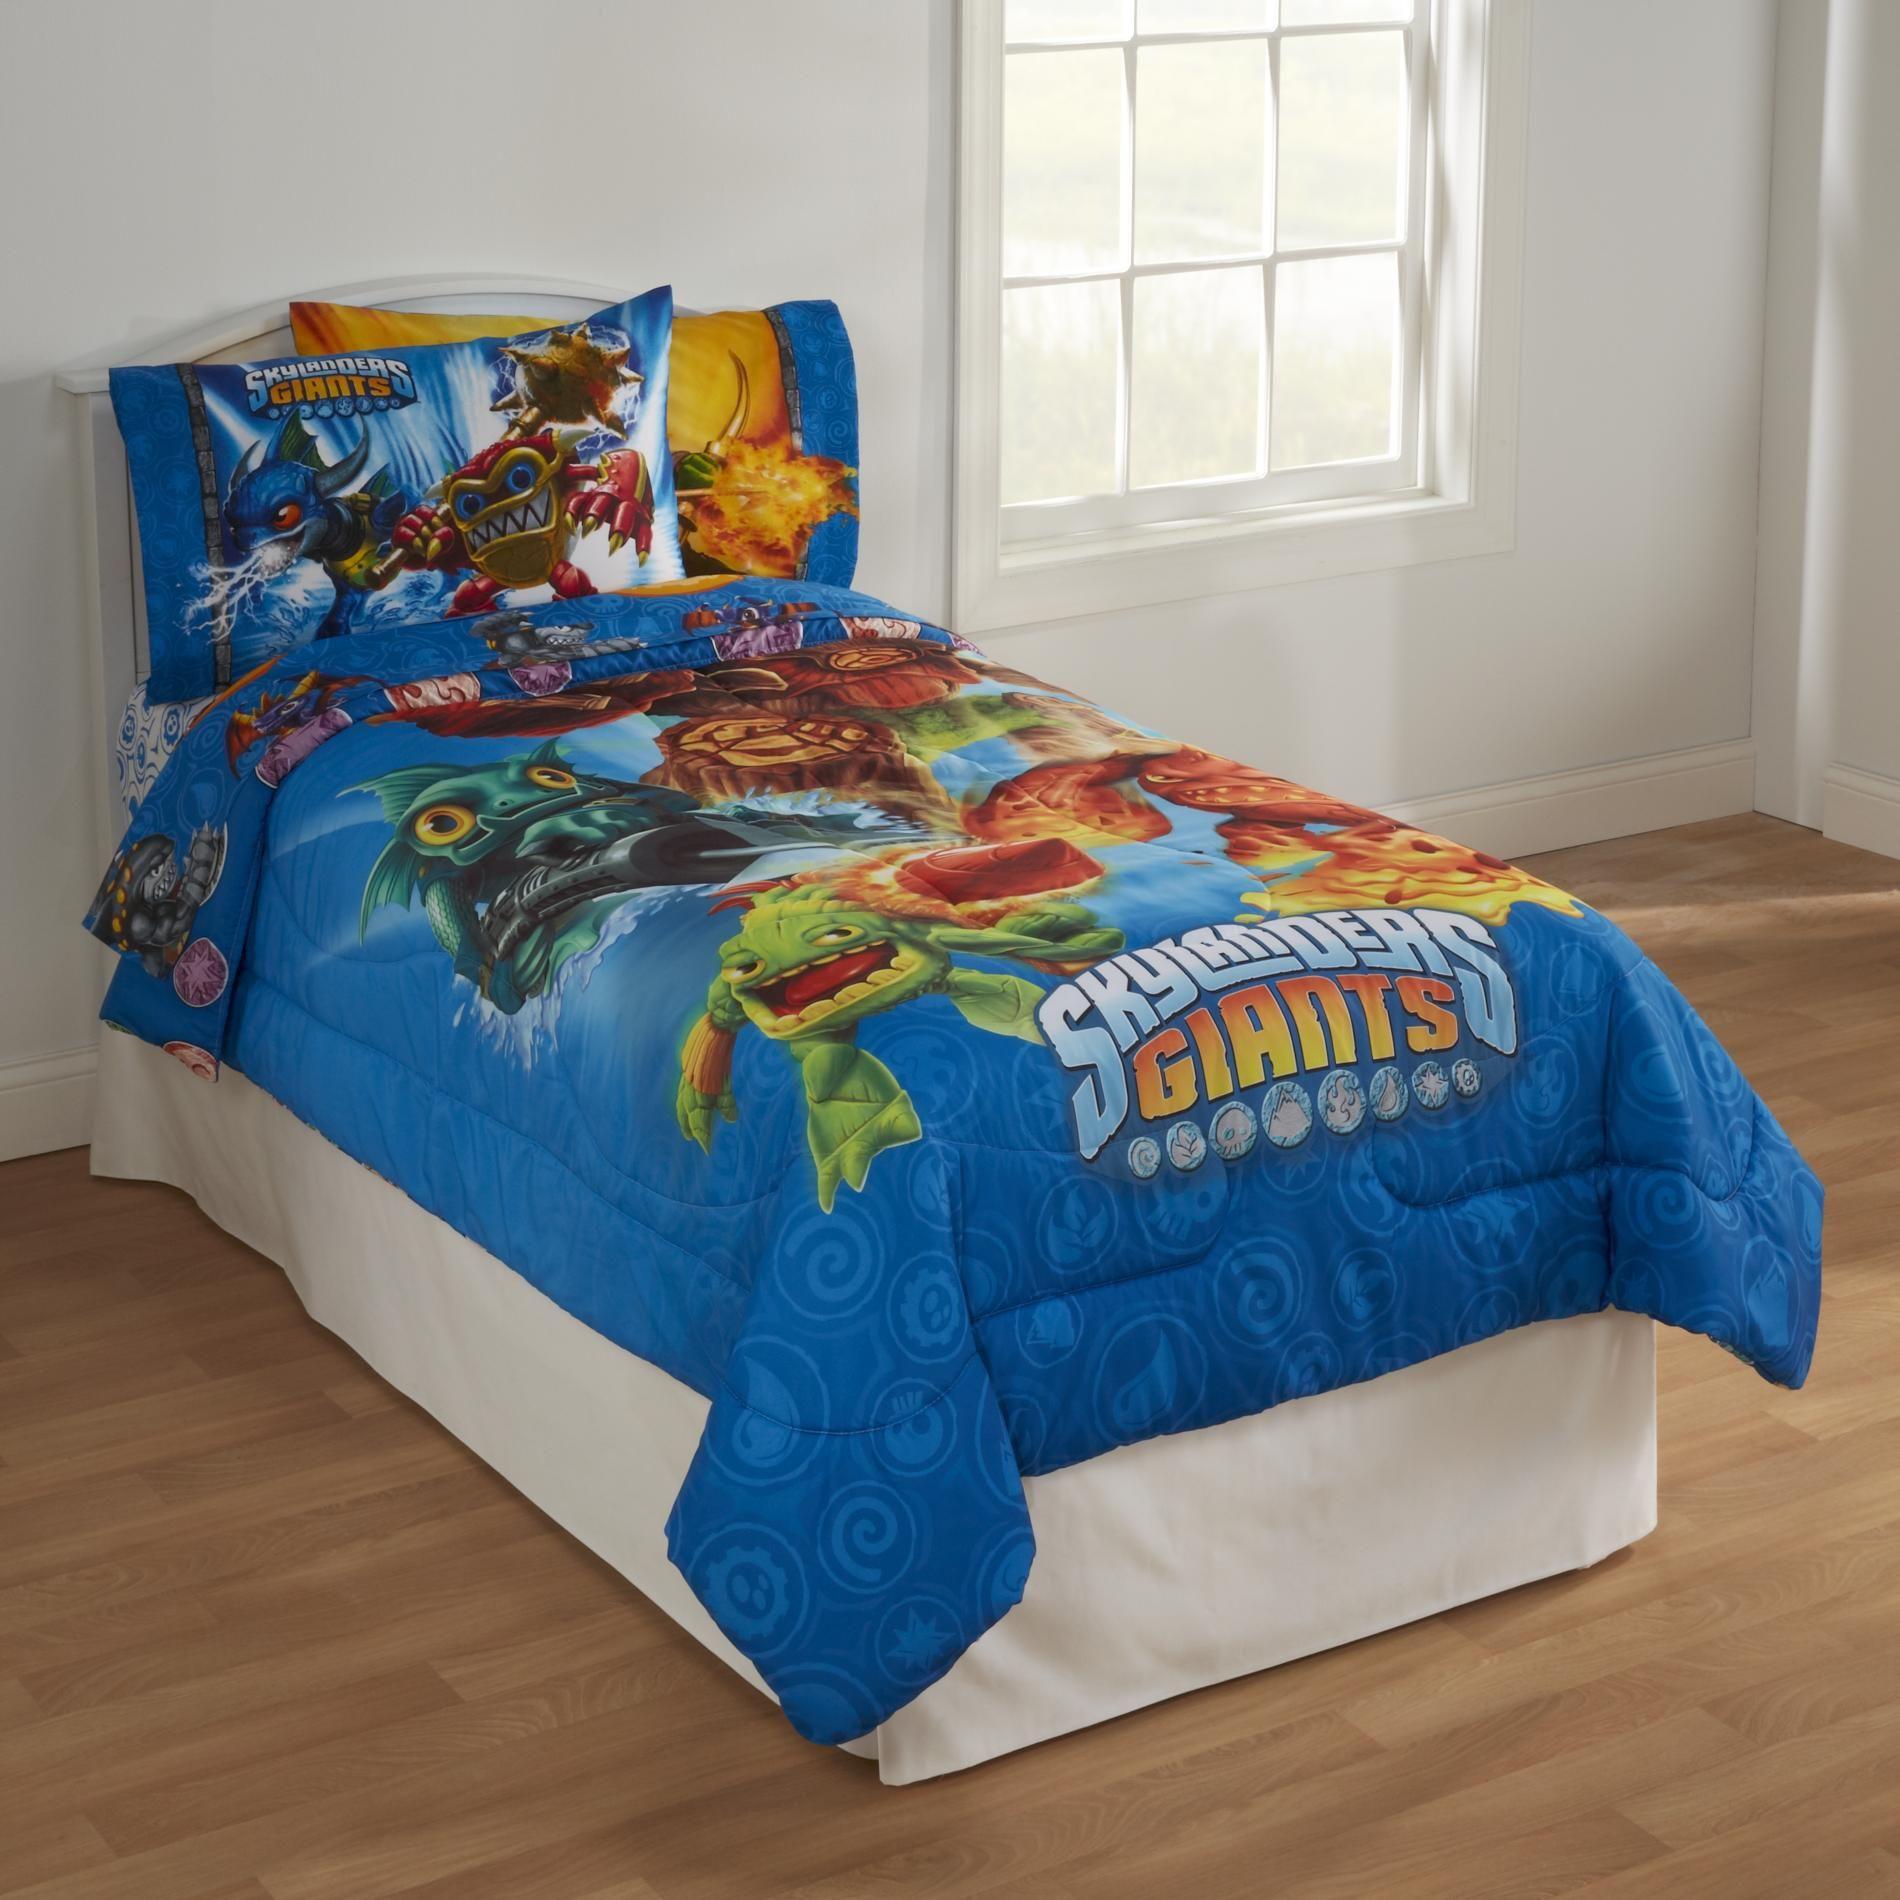 Bedrooms Furniture Kids Bedding Set Design Idea For Boys With